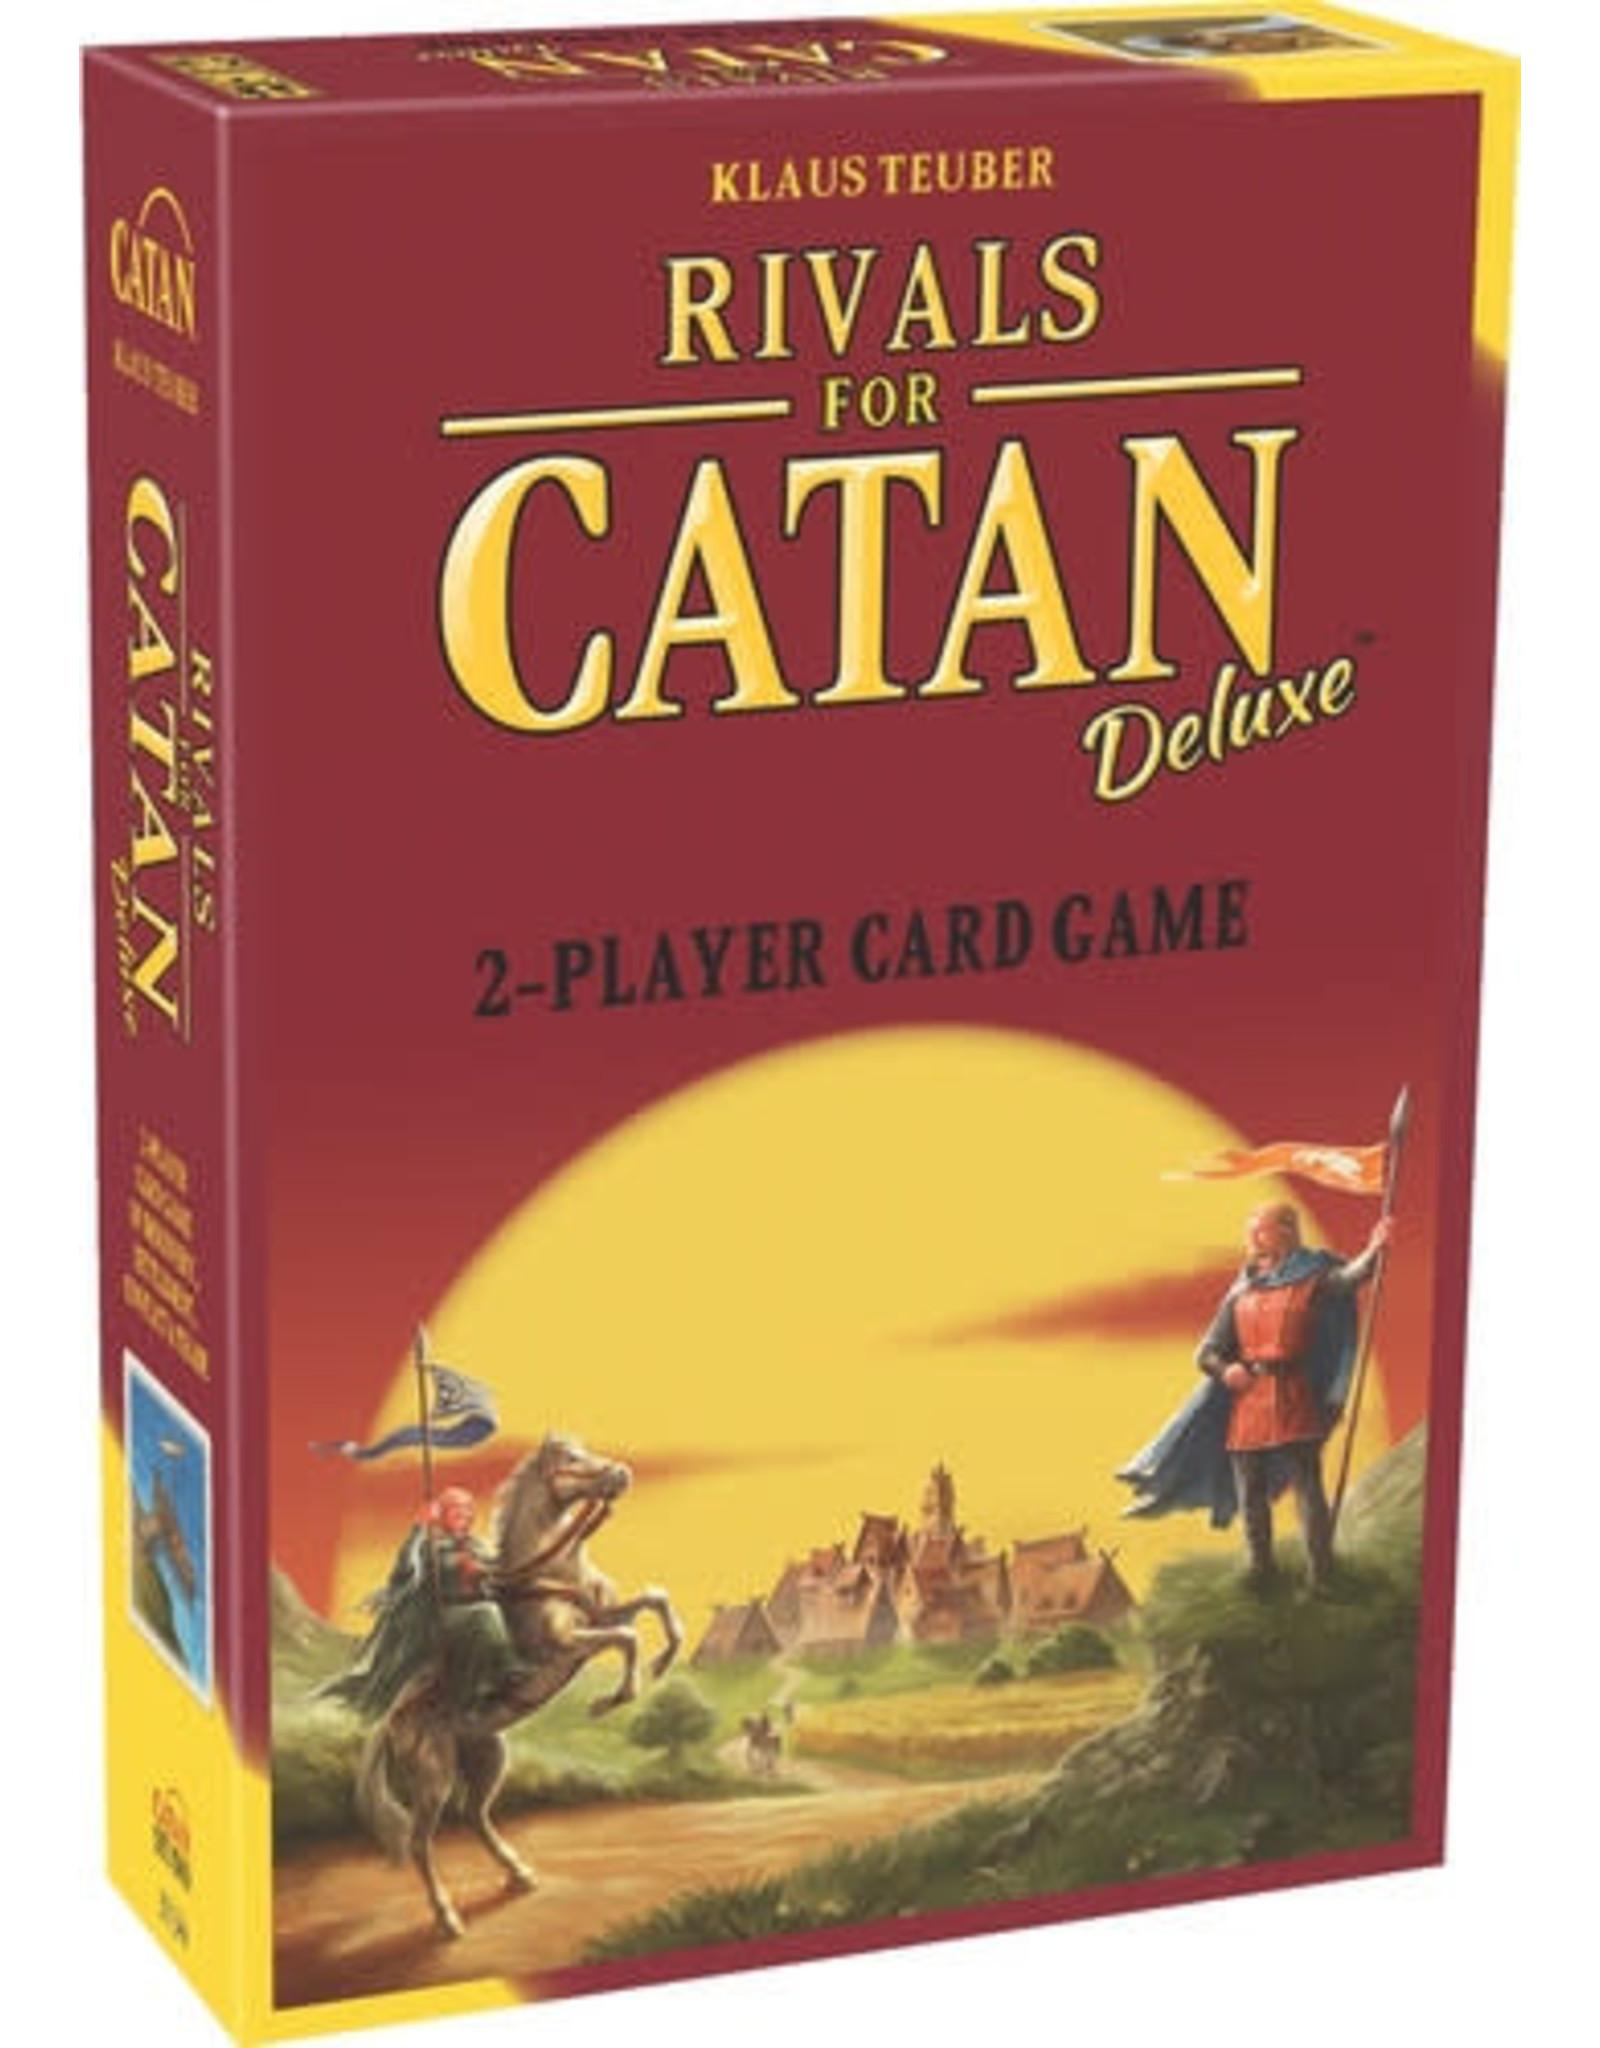 Catan: Rivals for Catan Deluxe